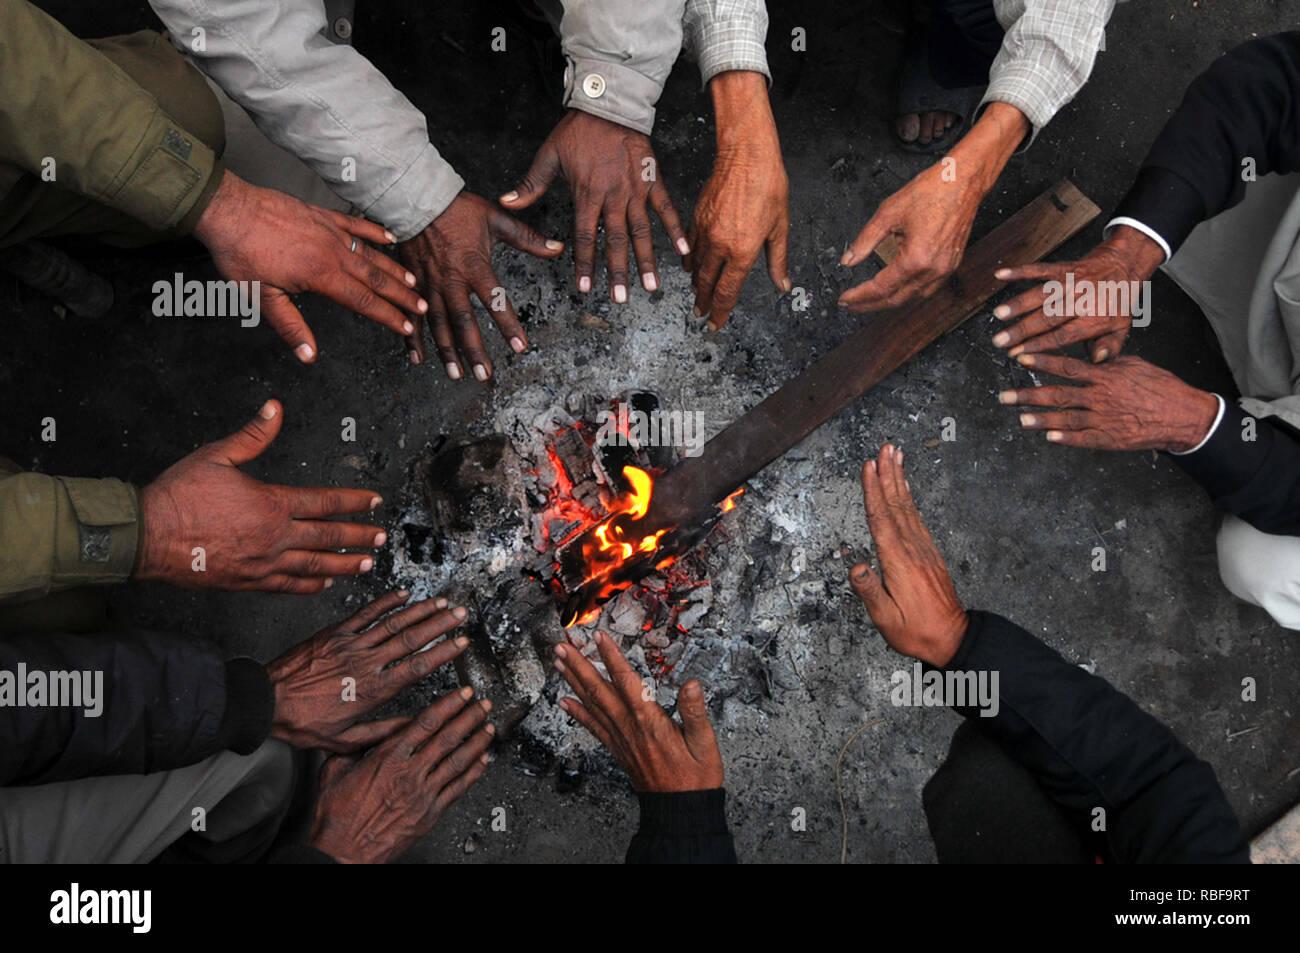 Jammu, Kashmir. 10th Jan, 2019. People warm their hands in Jammu, winter capital of Kashmir, Jan. 10, 2019. Credit: Stringer/Xinhua/Alamy Live News - Stock Image